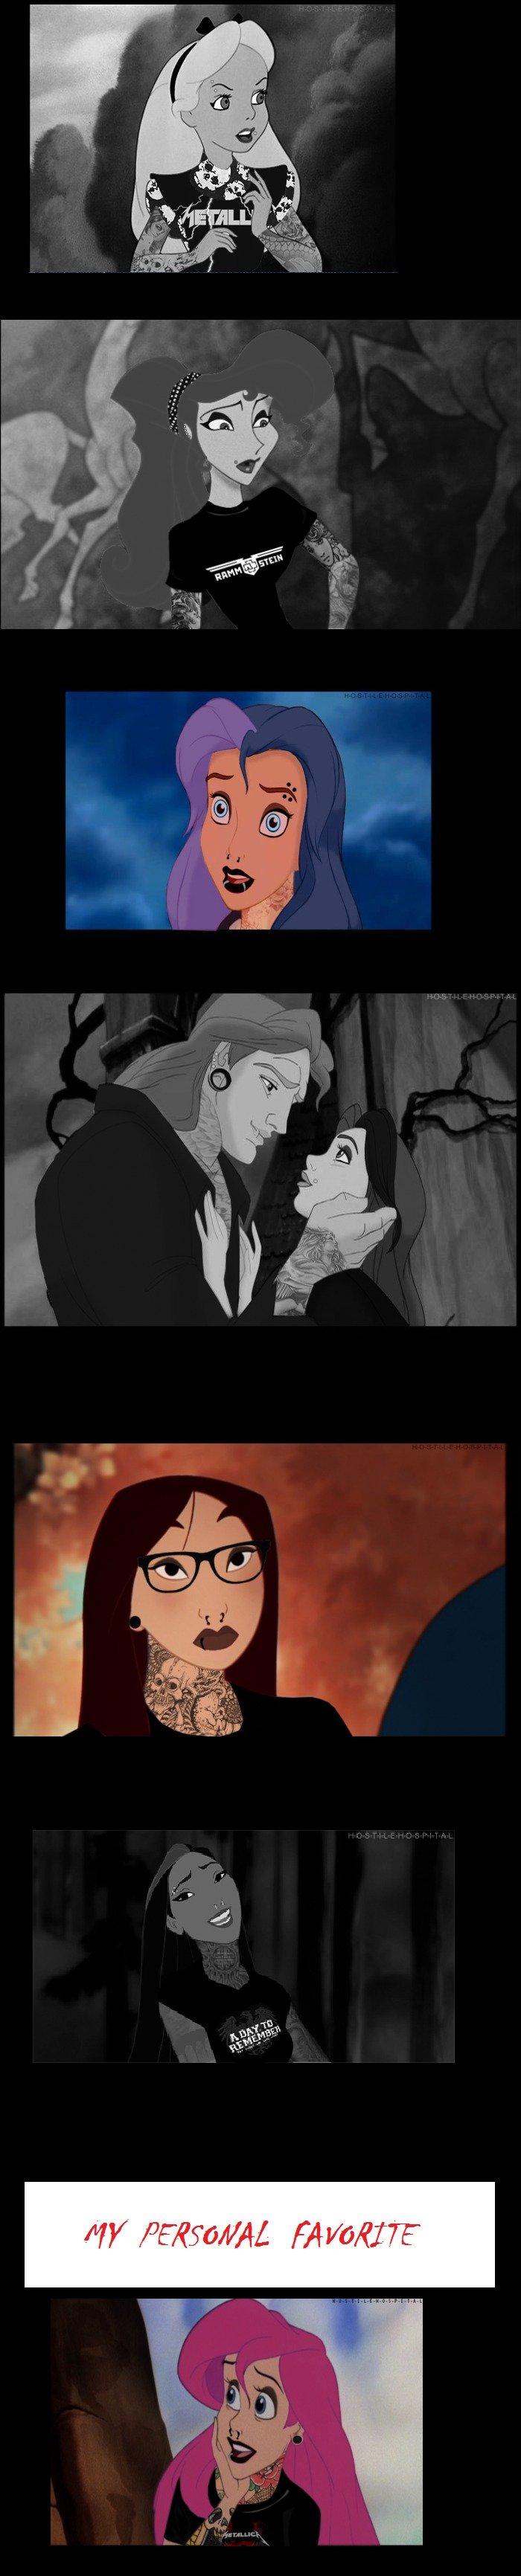 Goth and Emo Disney Chicks. . MY BIE' mira TE. It's good but...Metallica isn't goth.